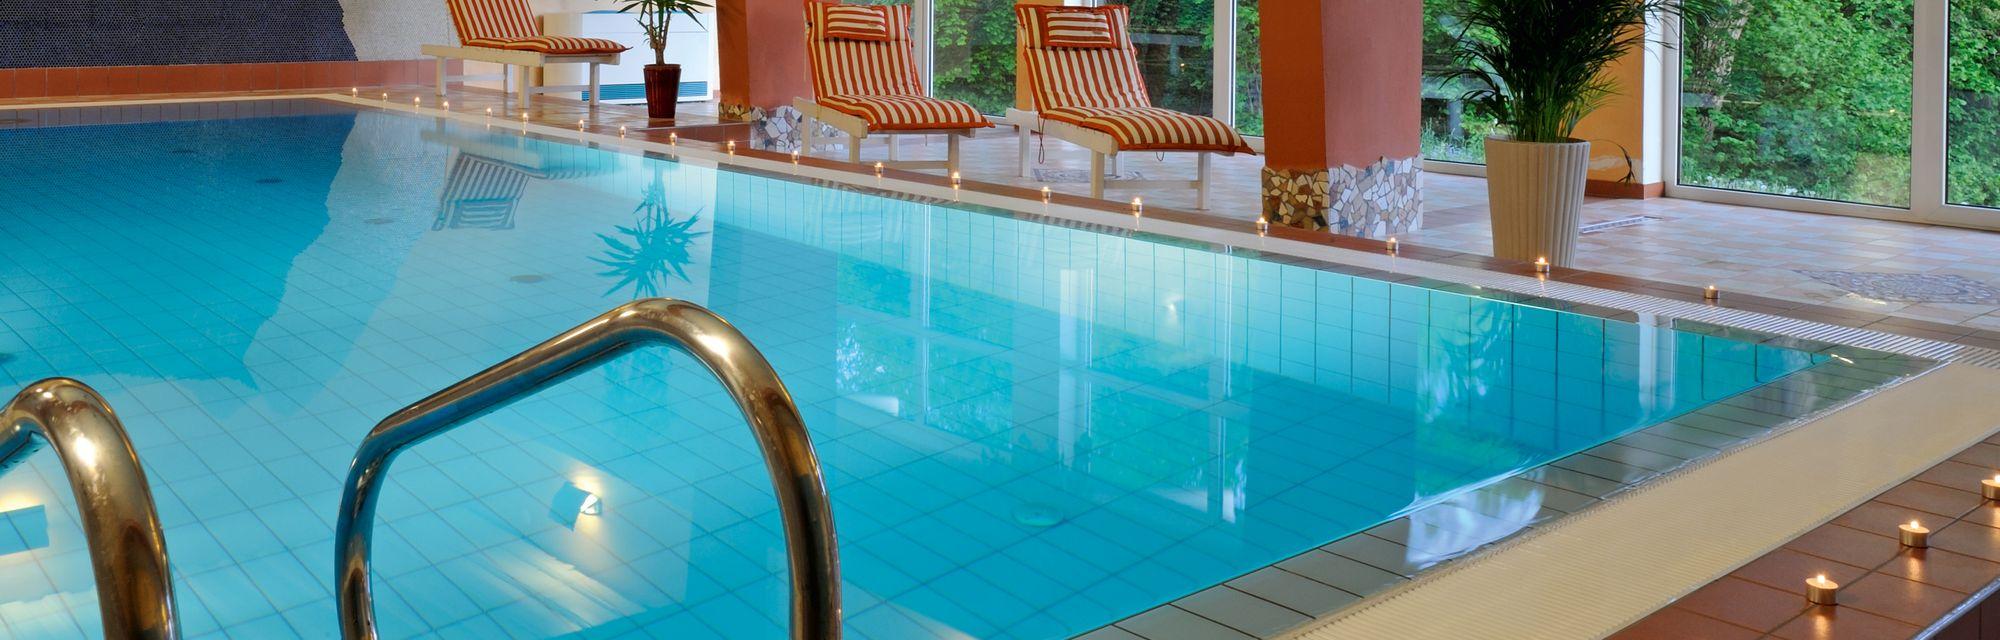 Beheizter Indoor-Pool im Streklhof